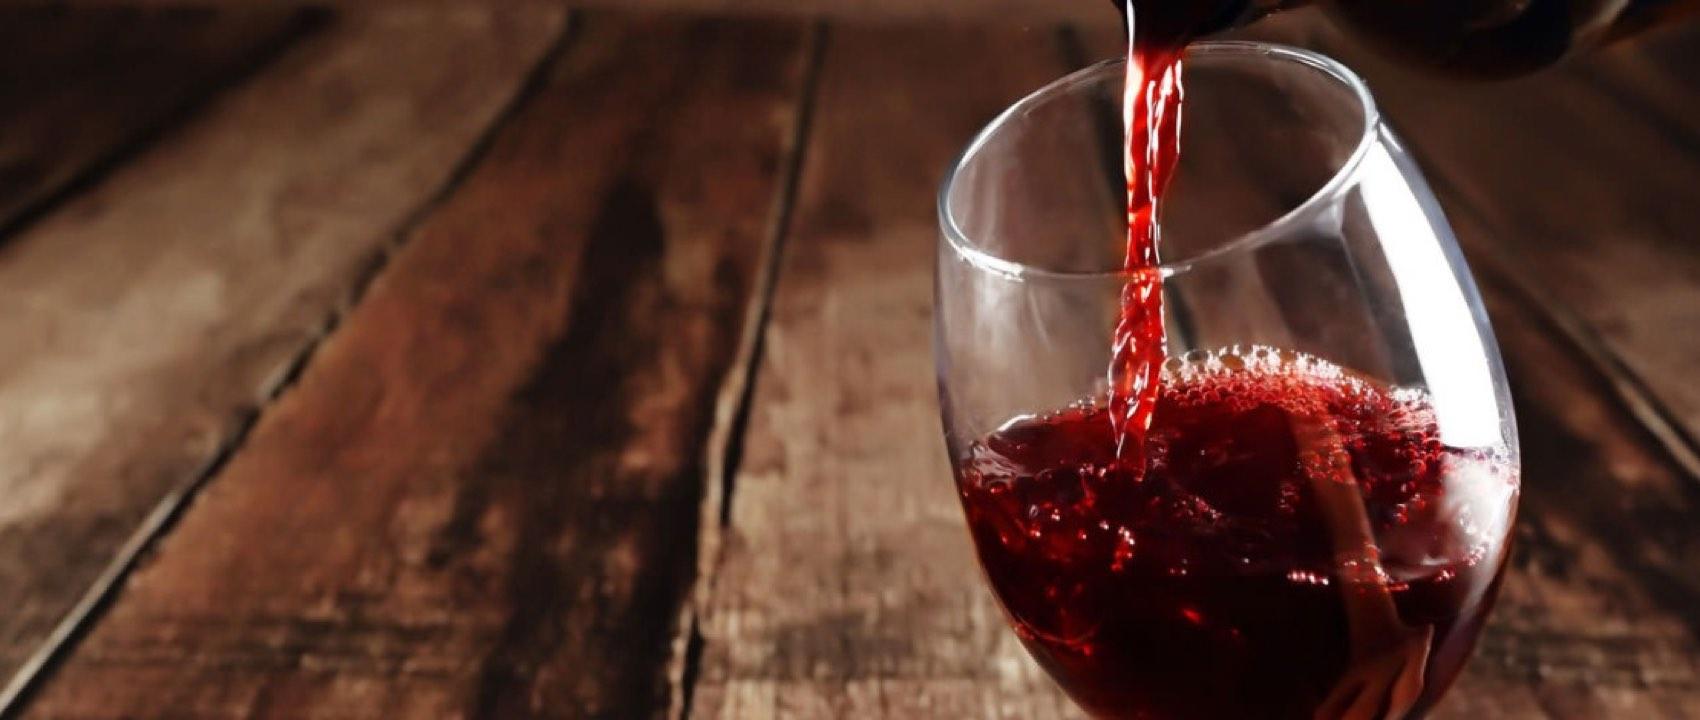 Malaga-region has som good wines